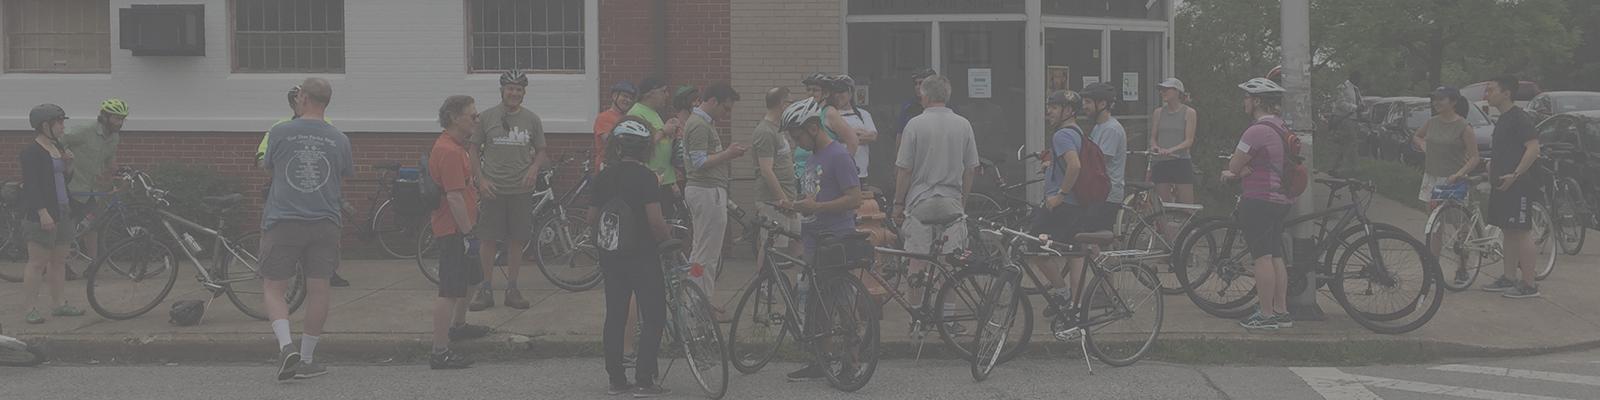 Baltimore Urban Farm Bike Ride 2017